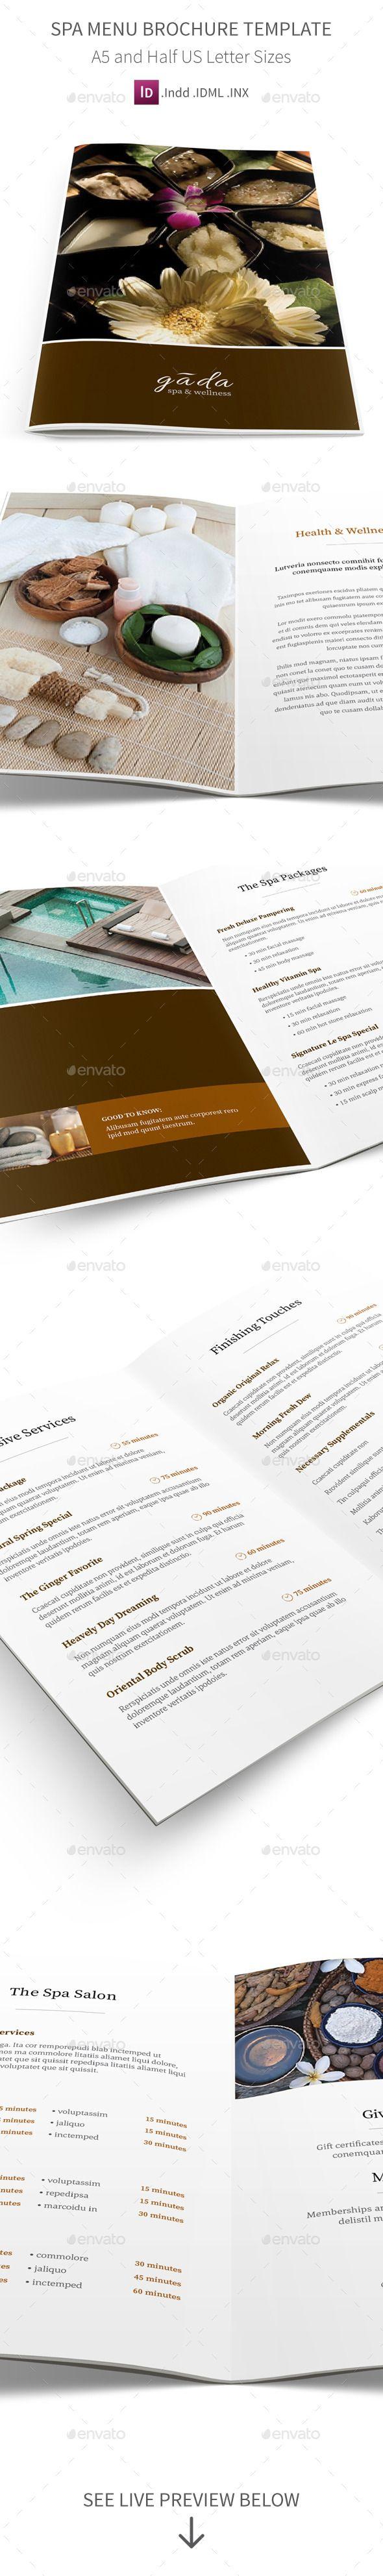 Spa Menu Brochure A5 Half Letter Sizes Wellness 14 Service